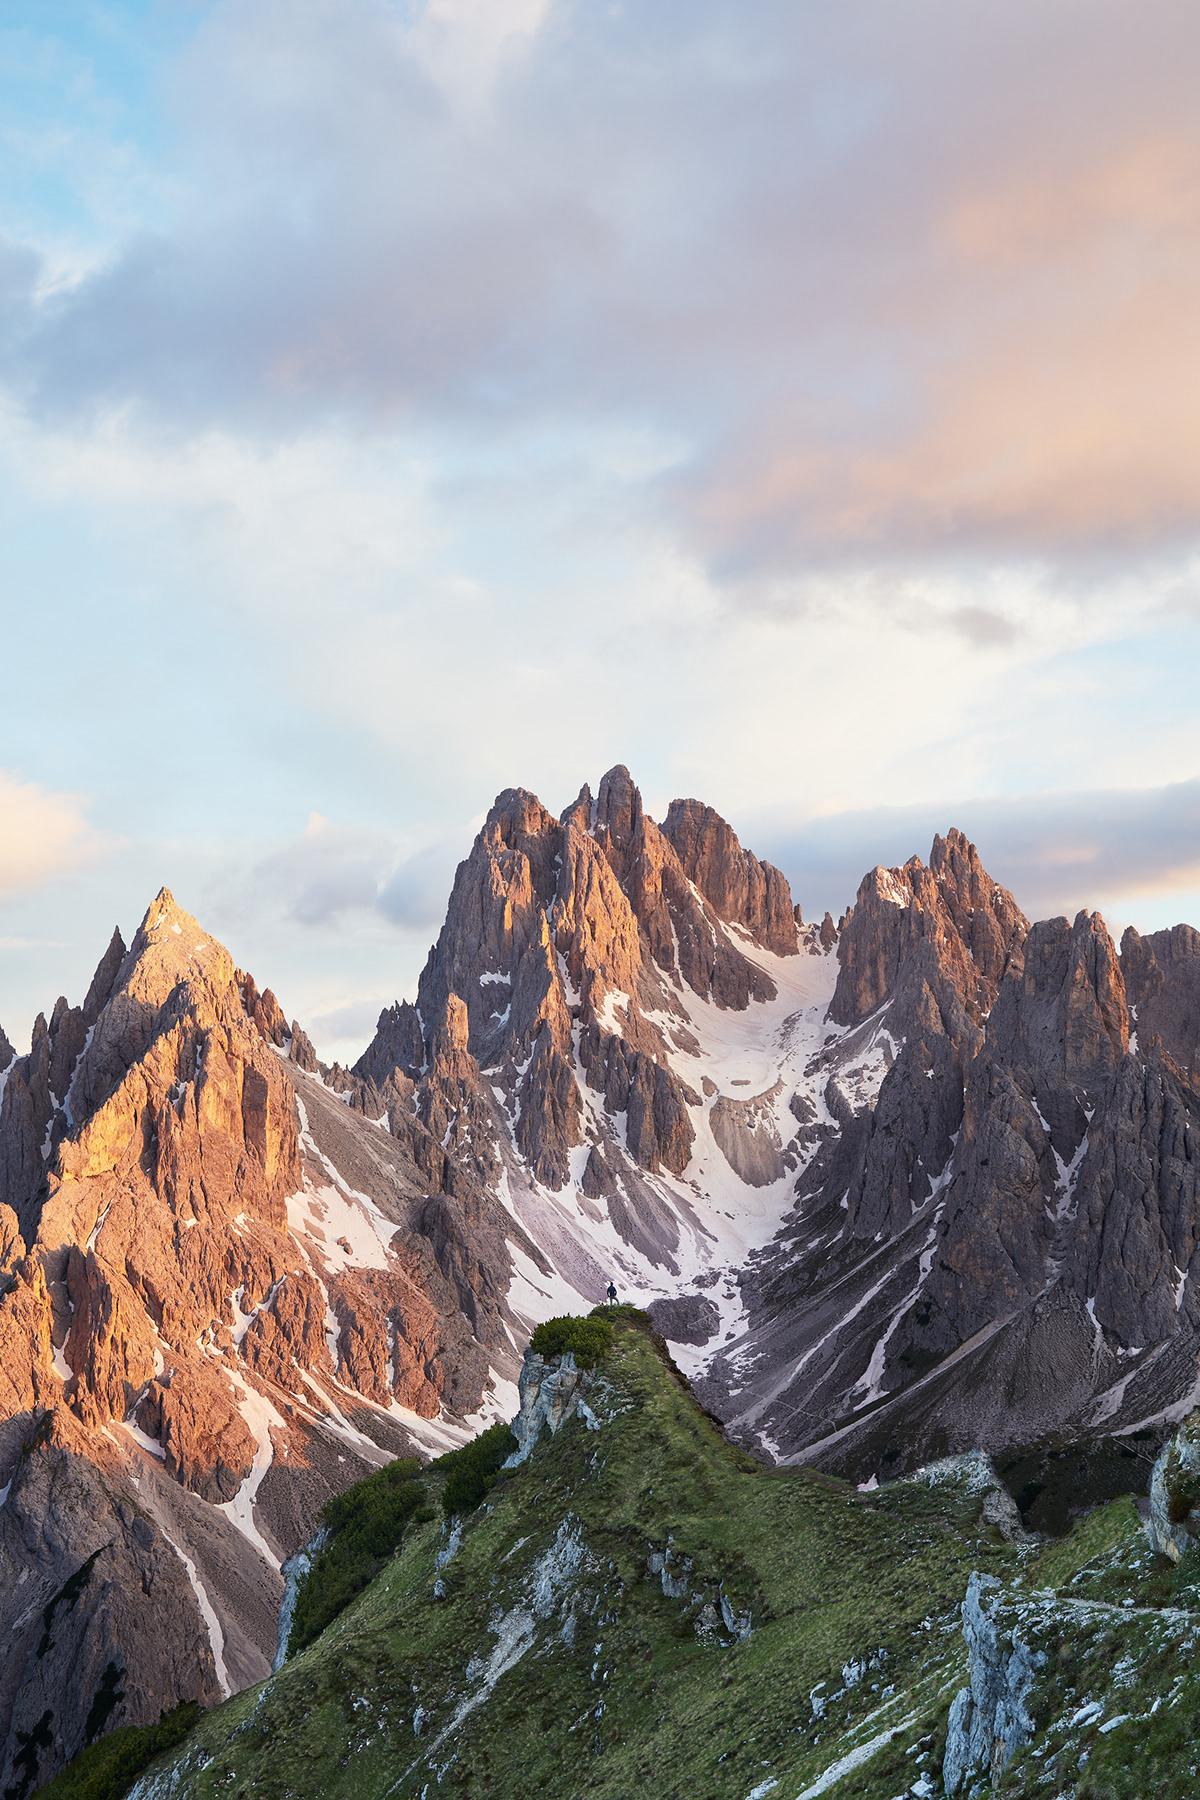 alpen glow alps dolomites Italy milky way mountains nighttime South Tirol stars tre cime